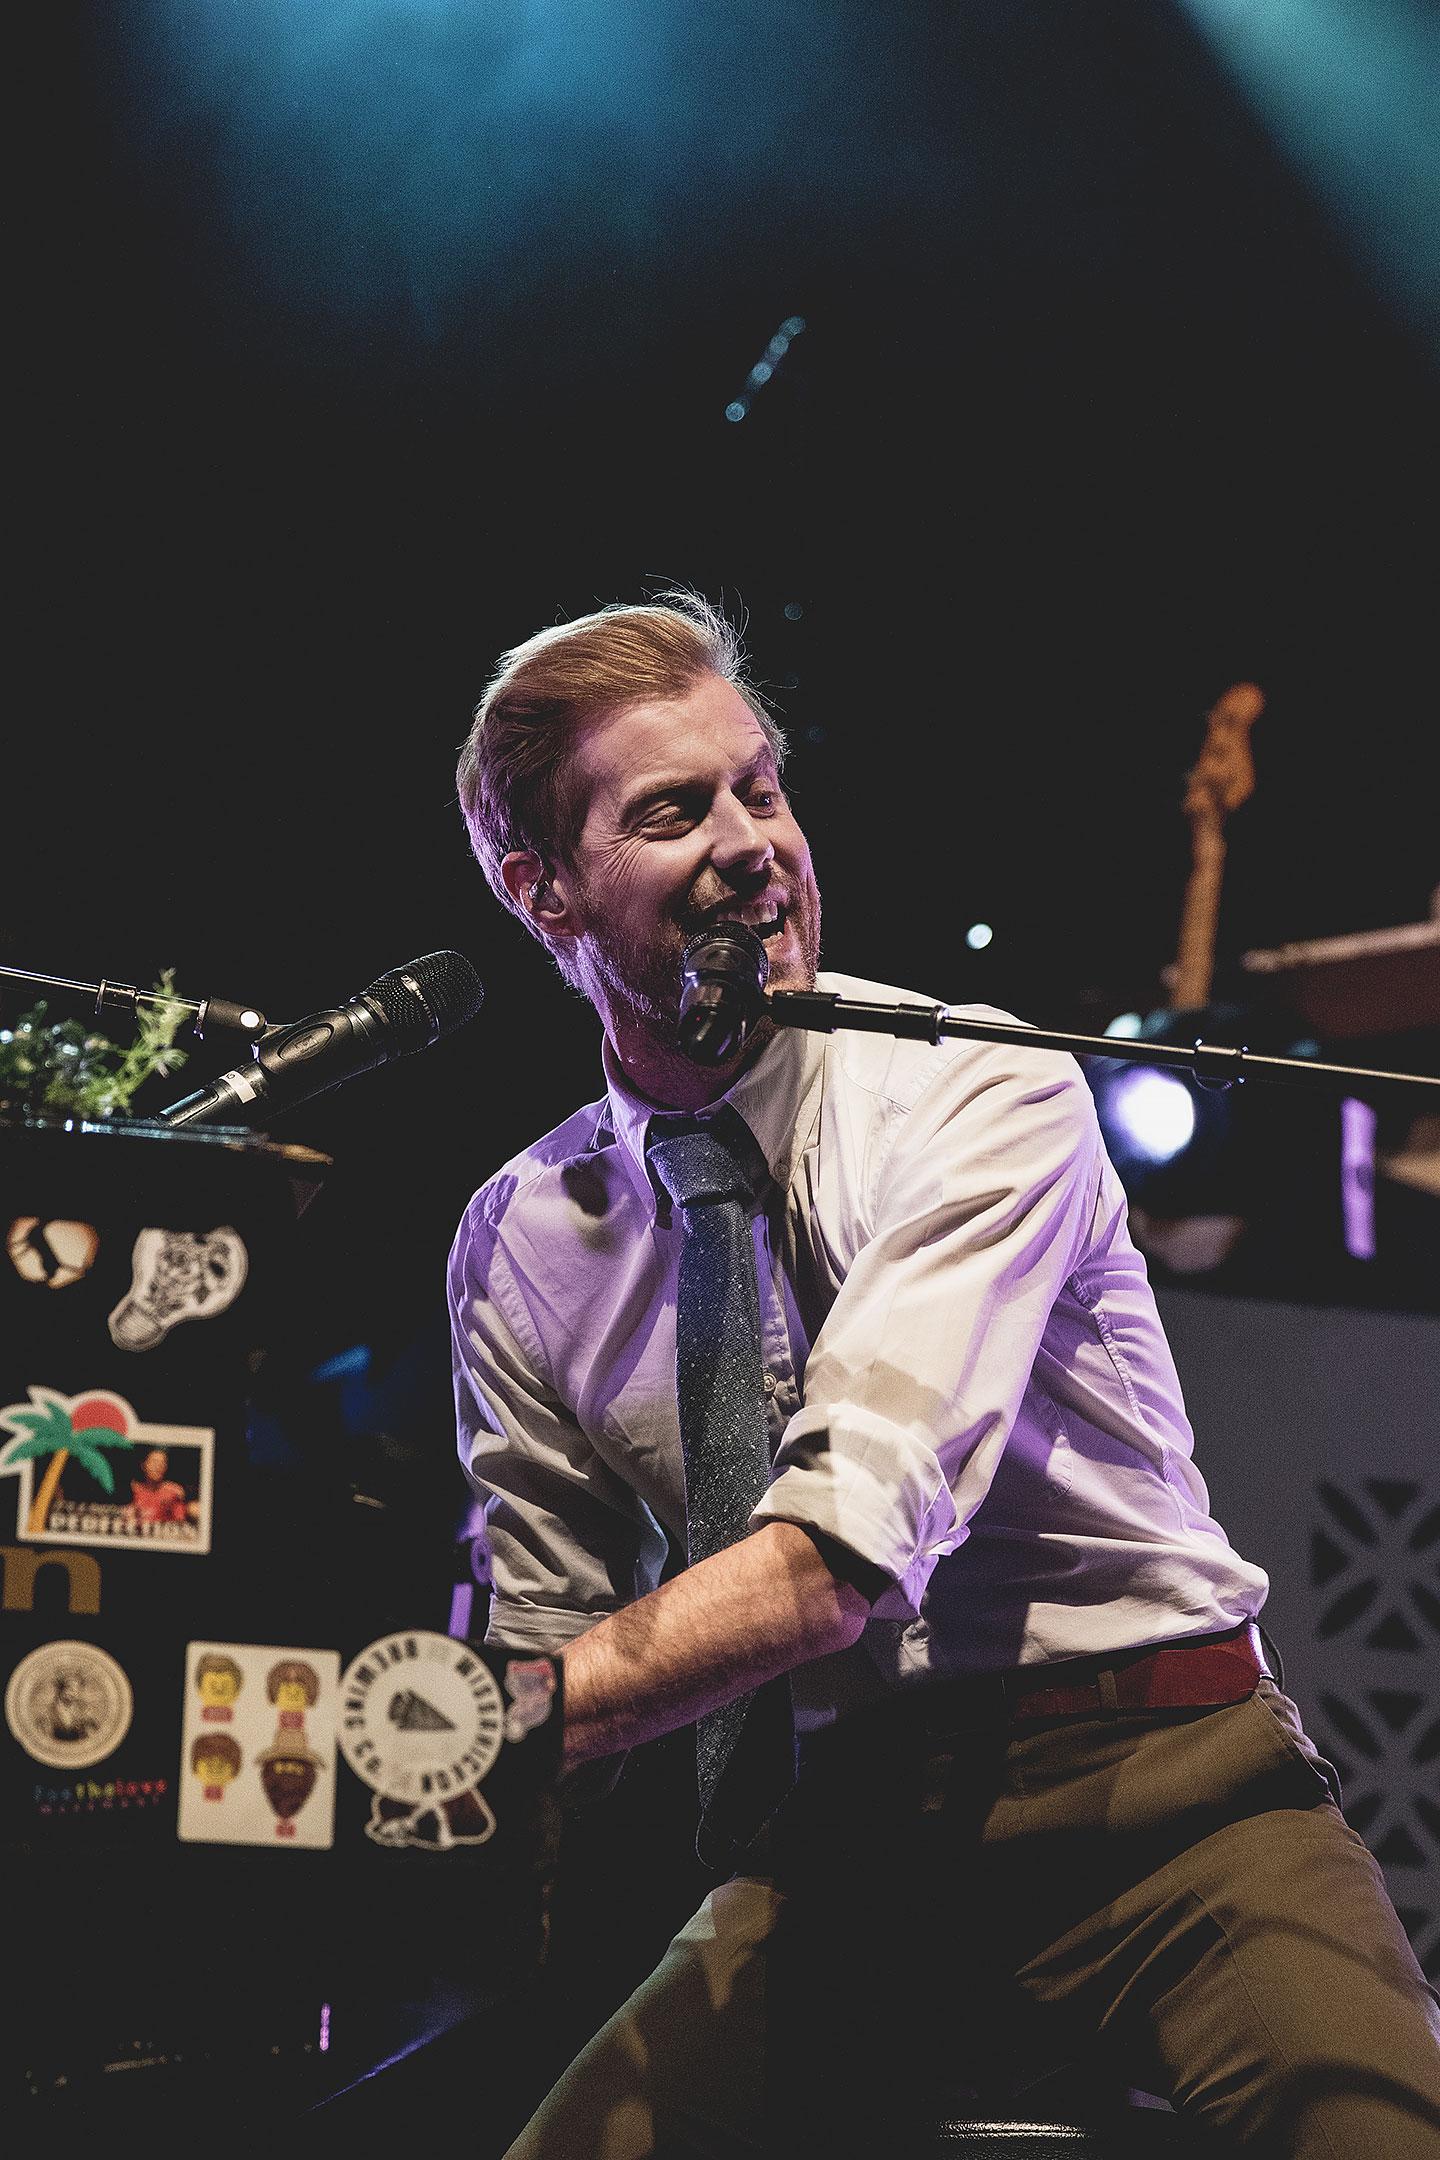 Andrew McMahon In The Wilderness - Flor - Grizfolk - Denver Concert Photos - The Fillmore Auditorium